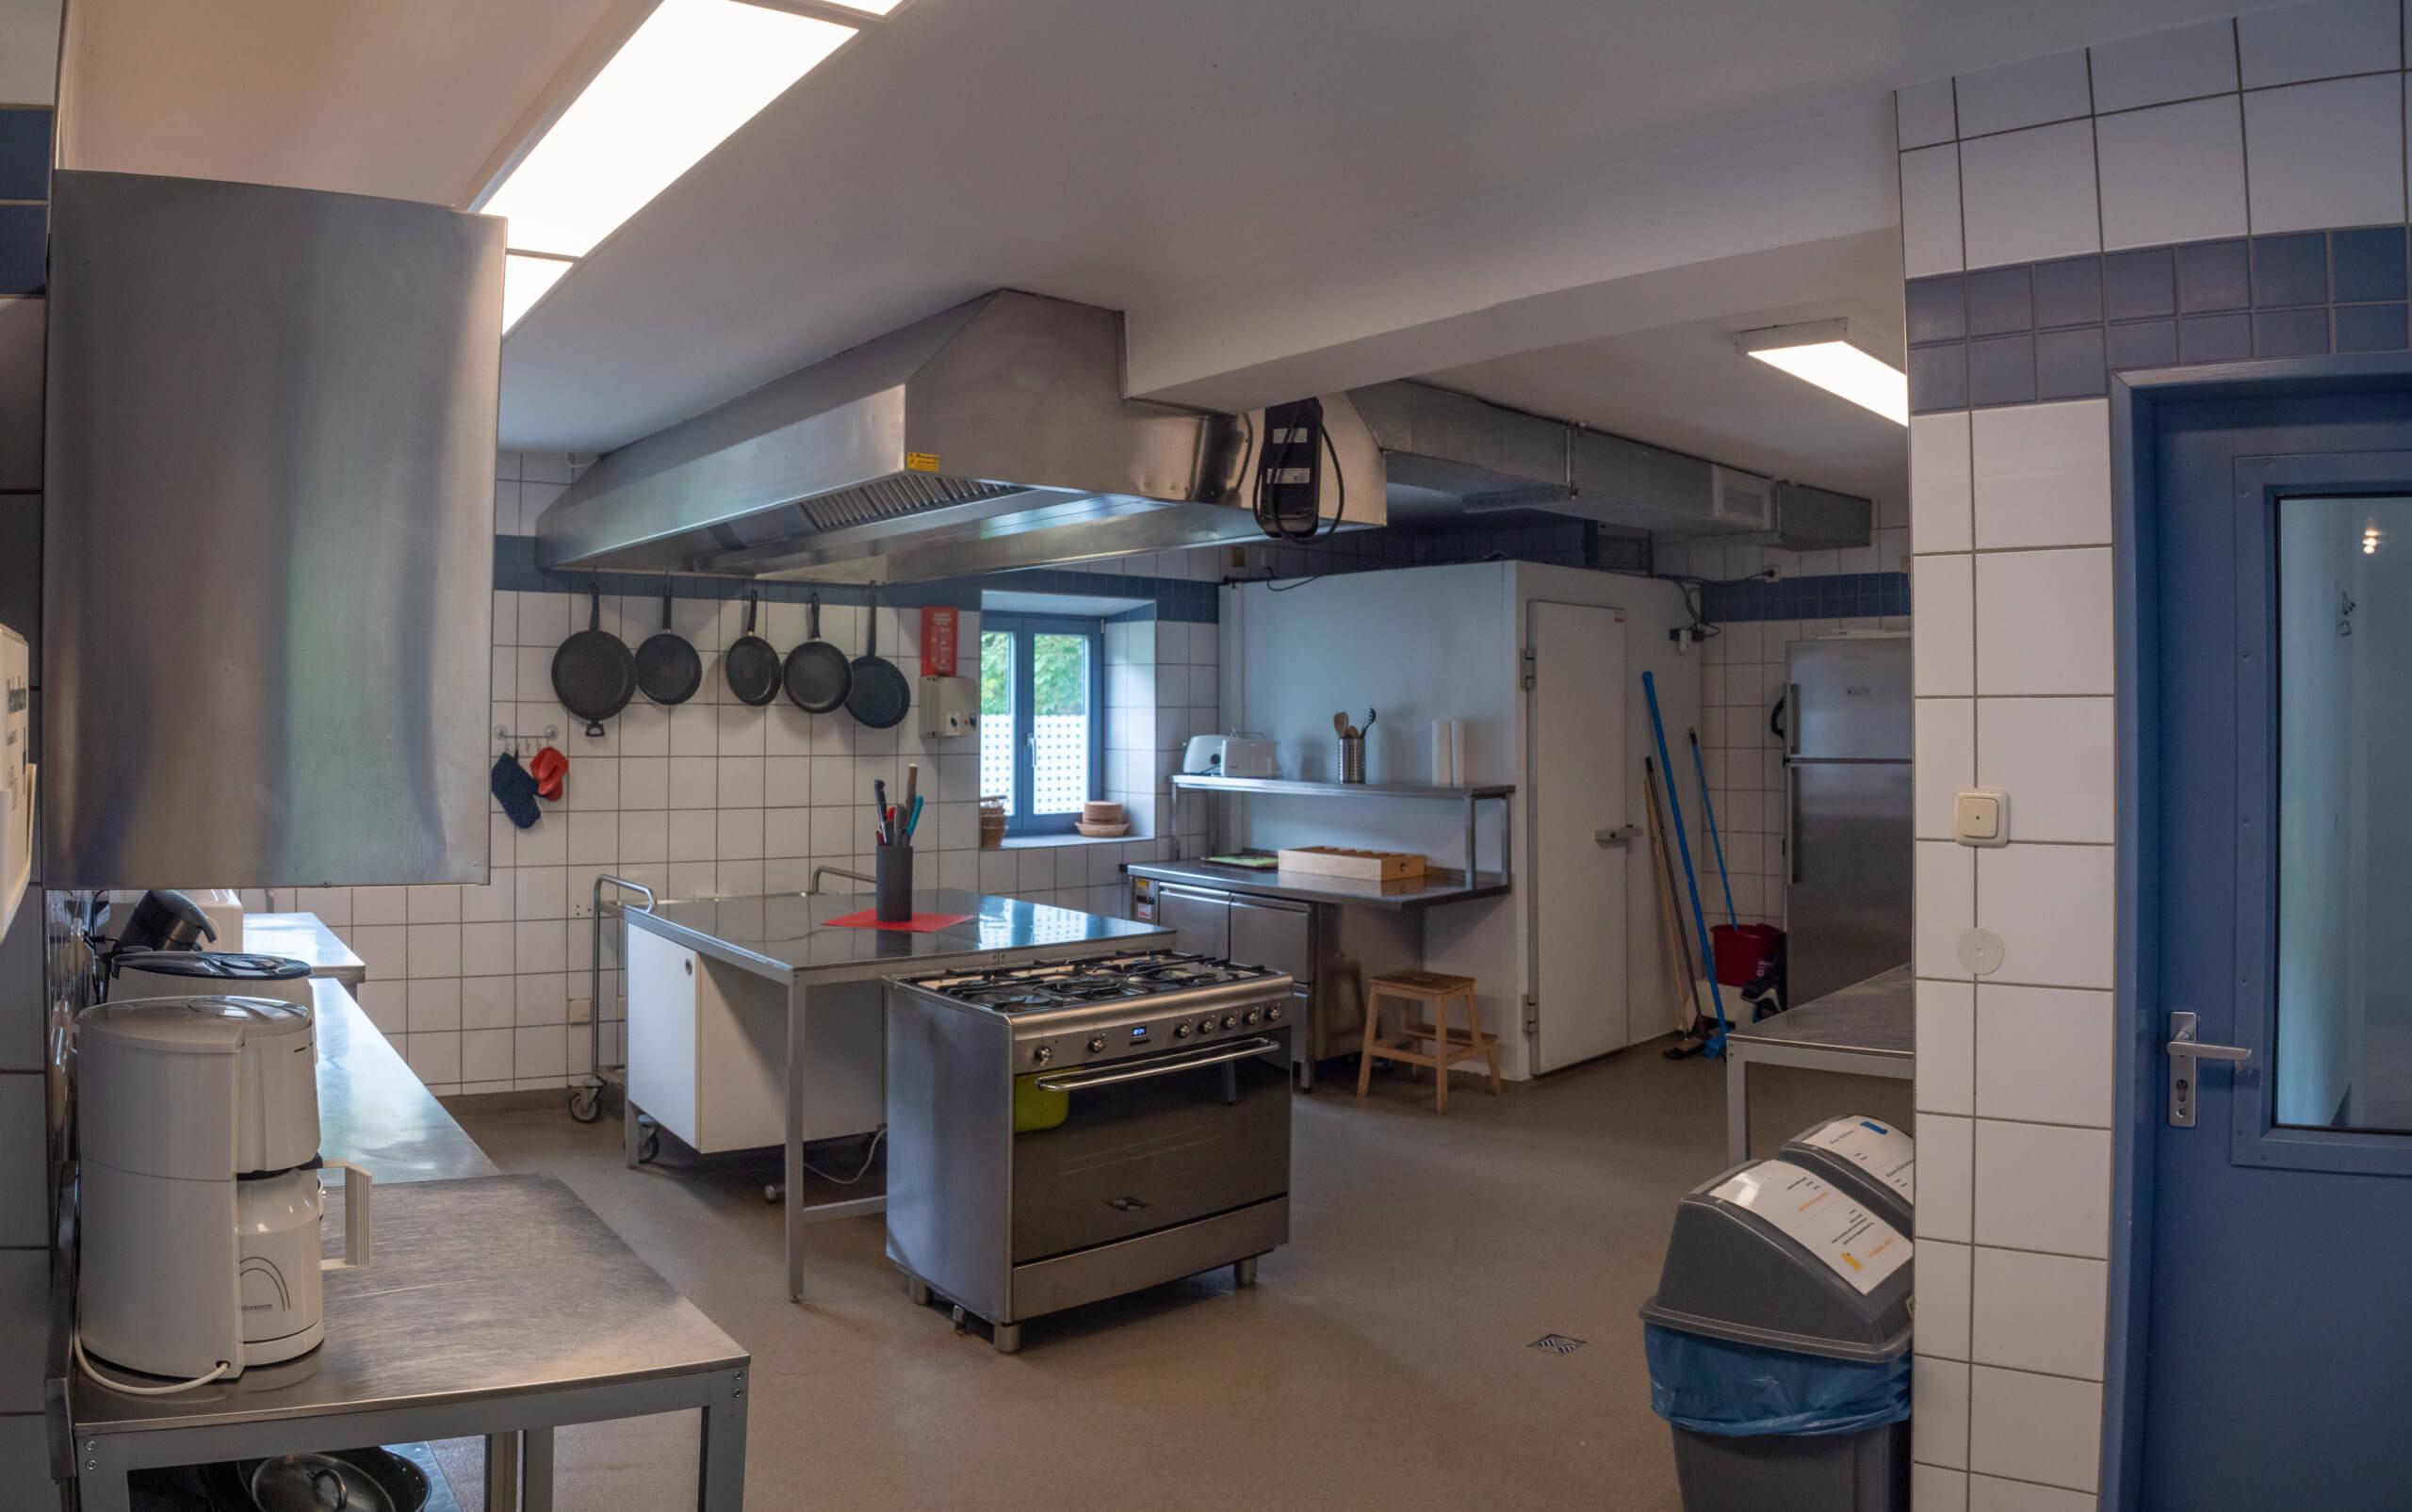 Innen - Küche #1 - Pano